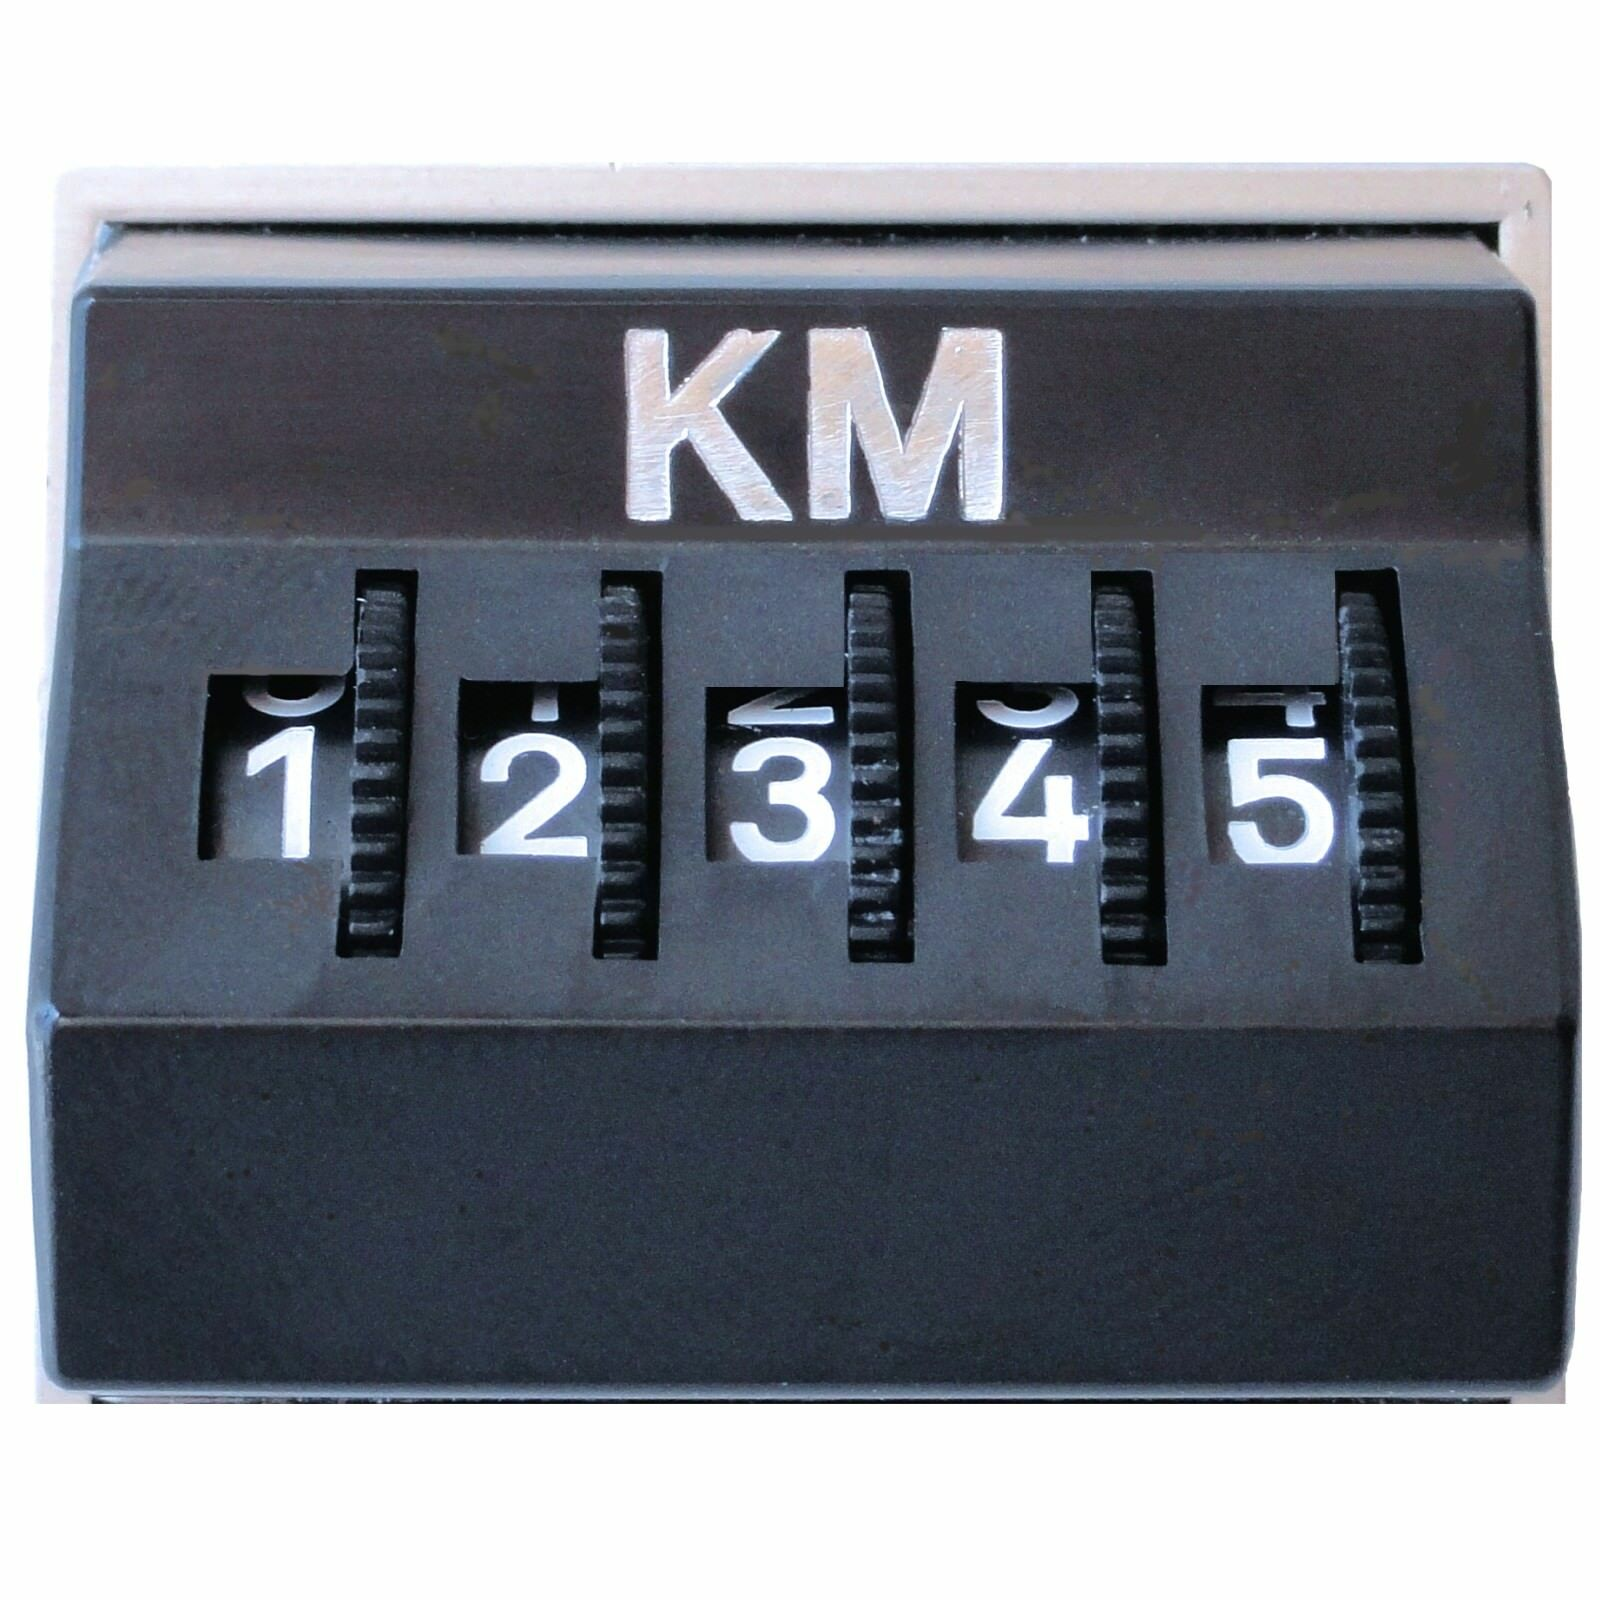 Bild 1 - Kilometerzähler Kilometermerker Kilometer KM Zähler original 1977 HR / RICHTER